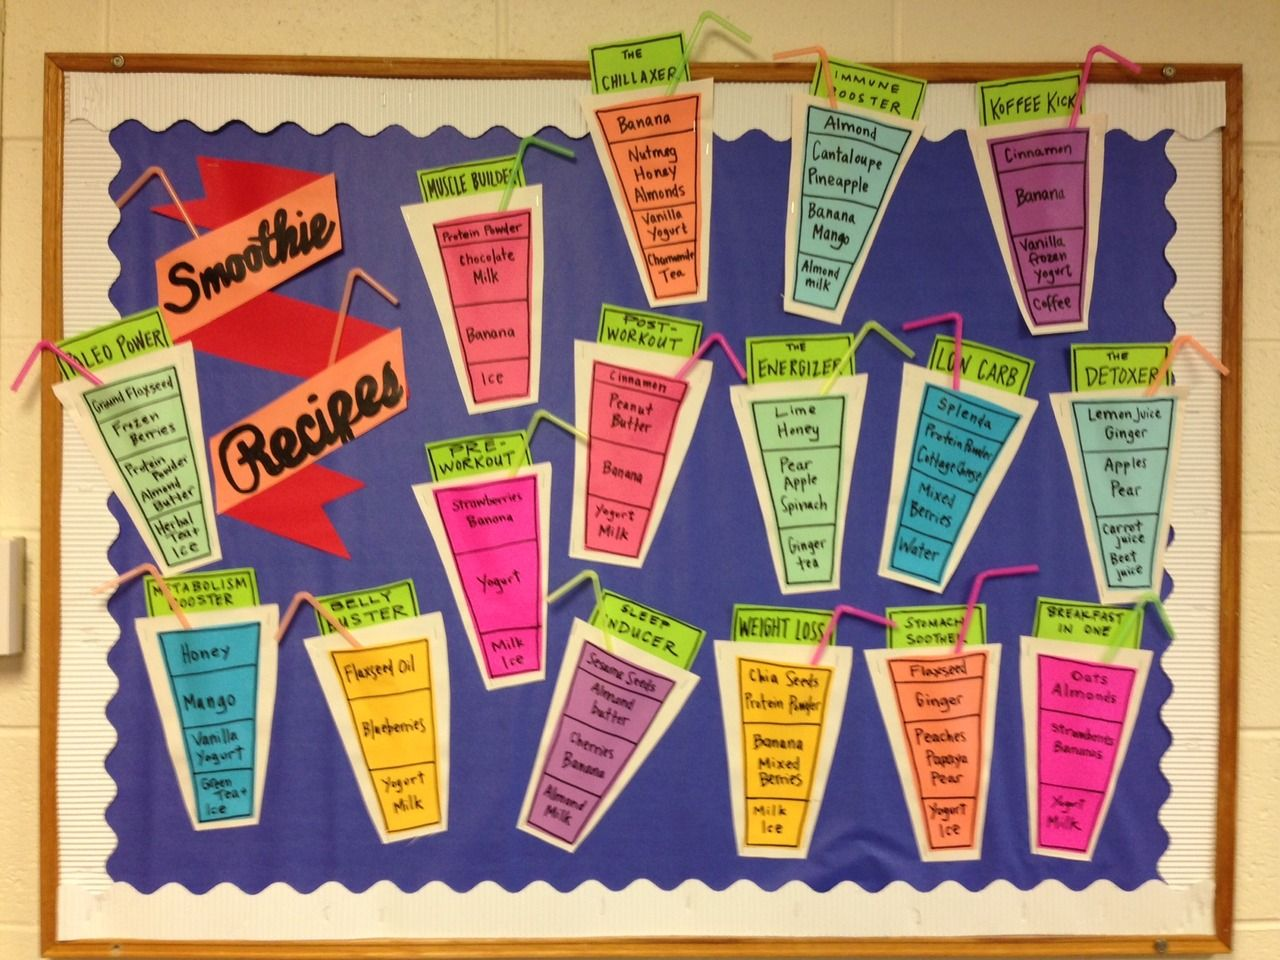 Classroom Bulletin Board Ideas Nutrition Month : Smoothie ideas great idea for a bulletin board in the